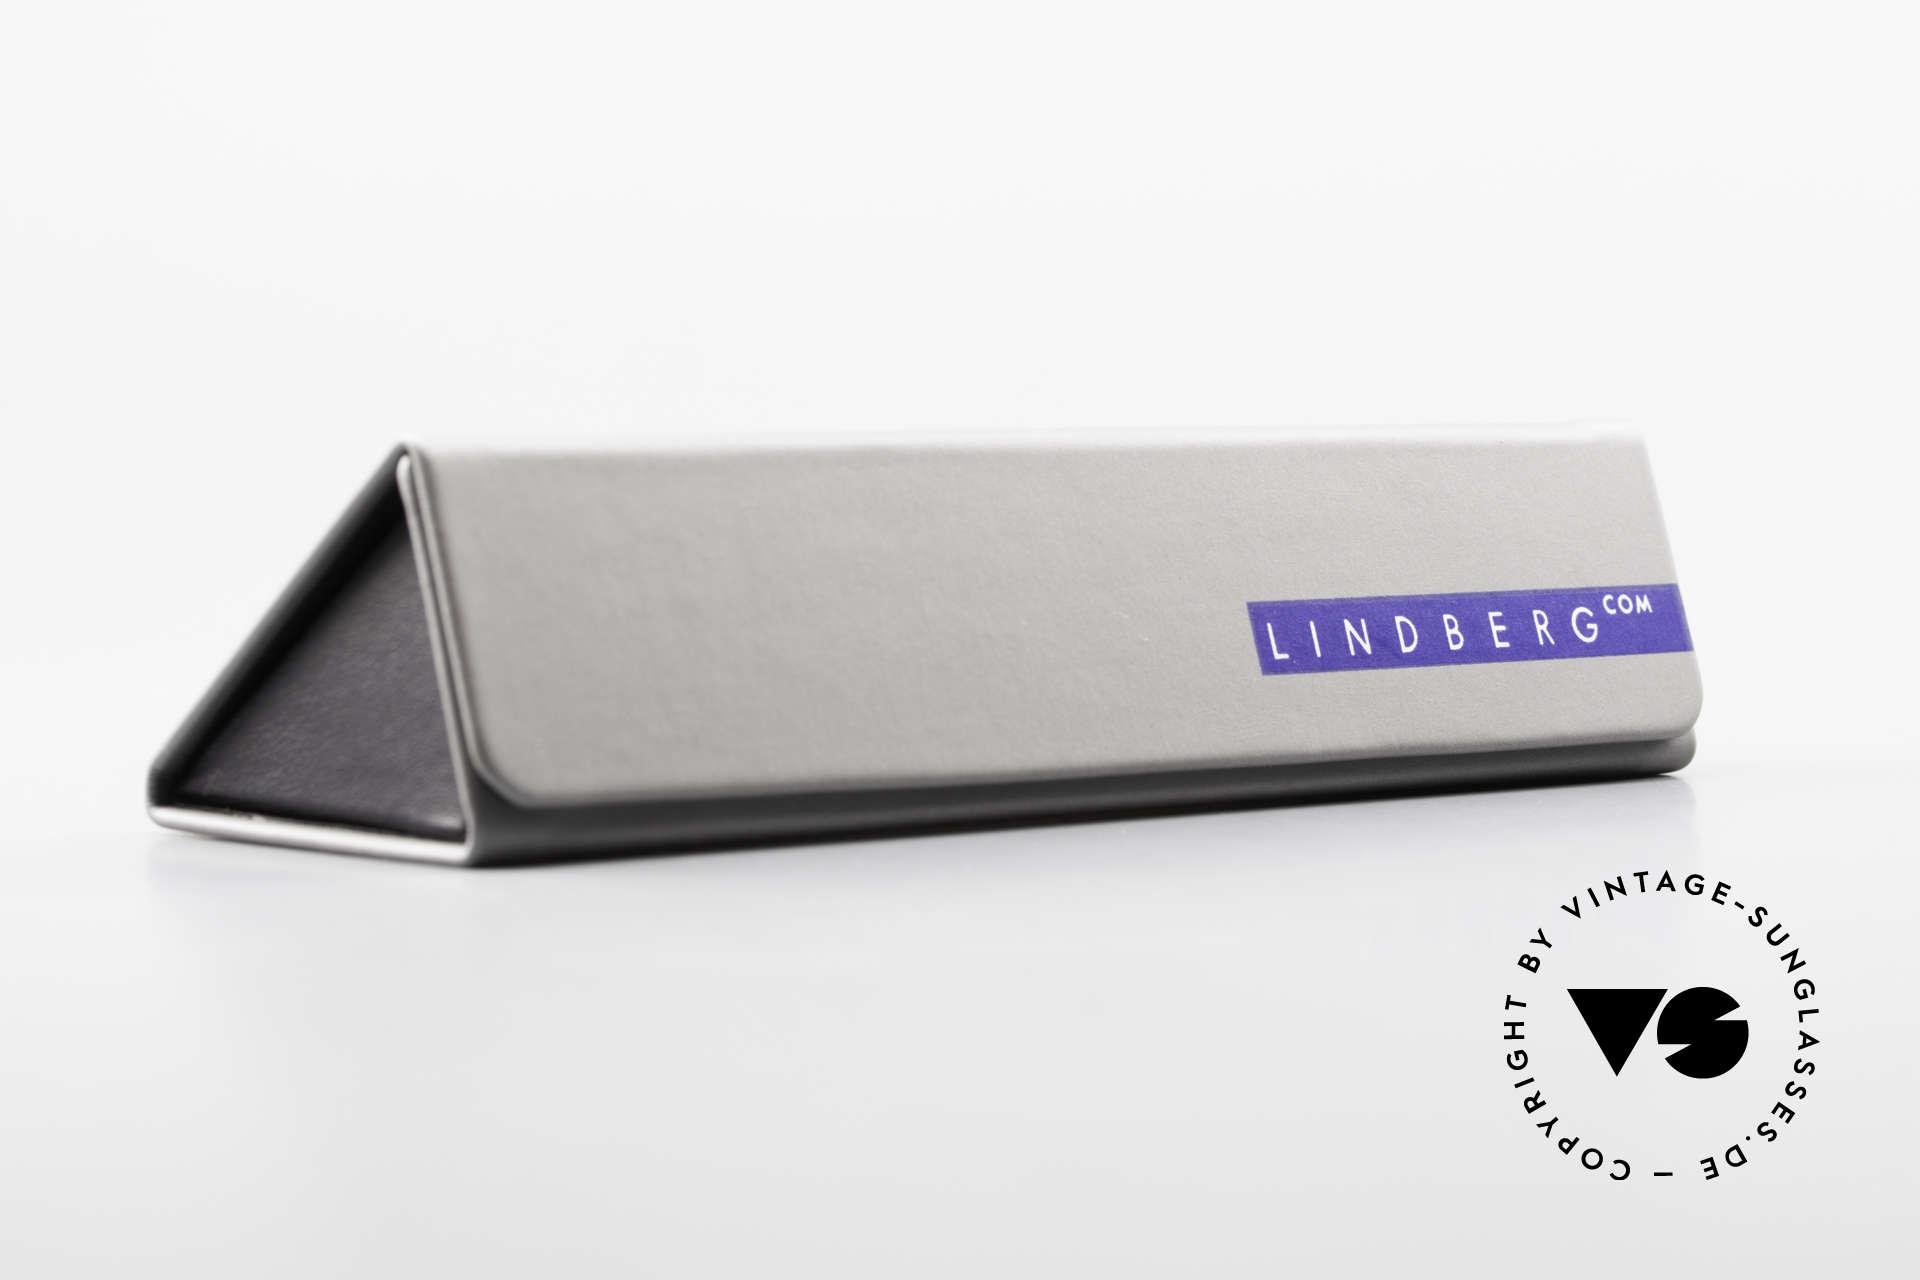 Lindberg Cameron Air Titan Rim Round Titan Glasses Acetate, Size: medium, Made for Men and Women